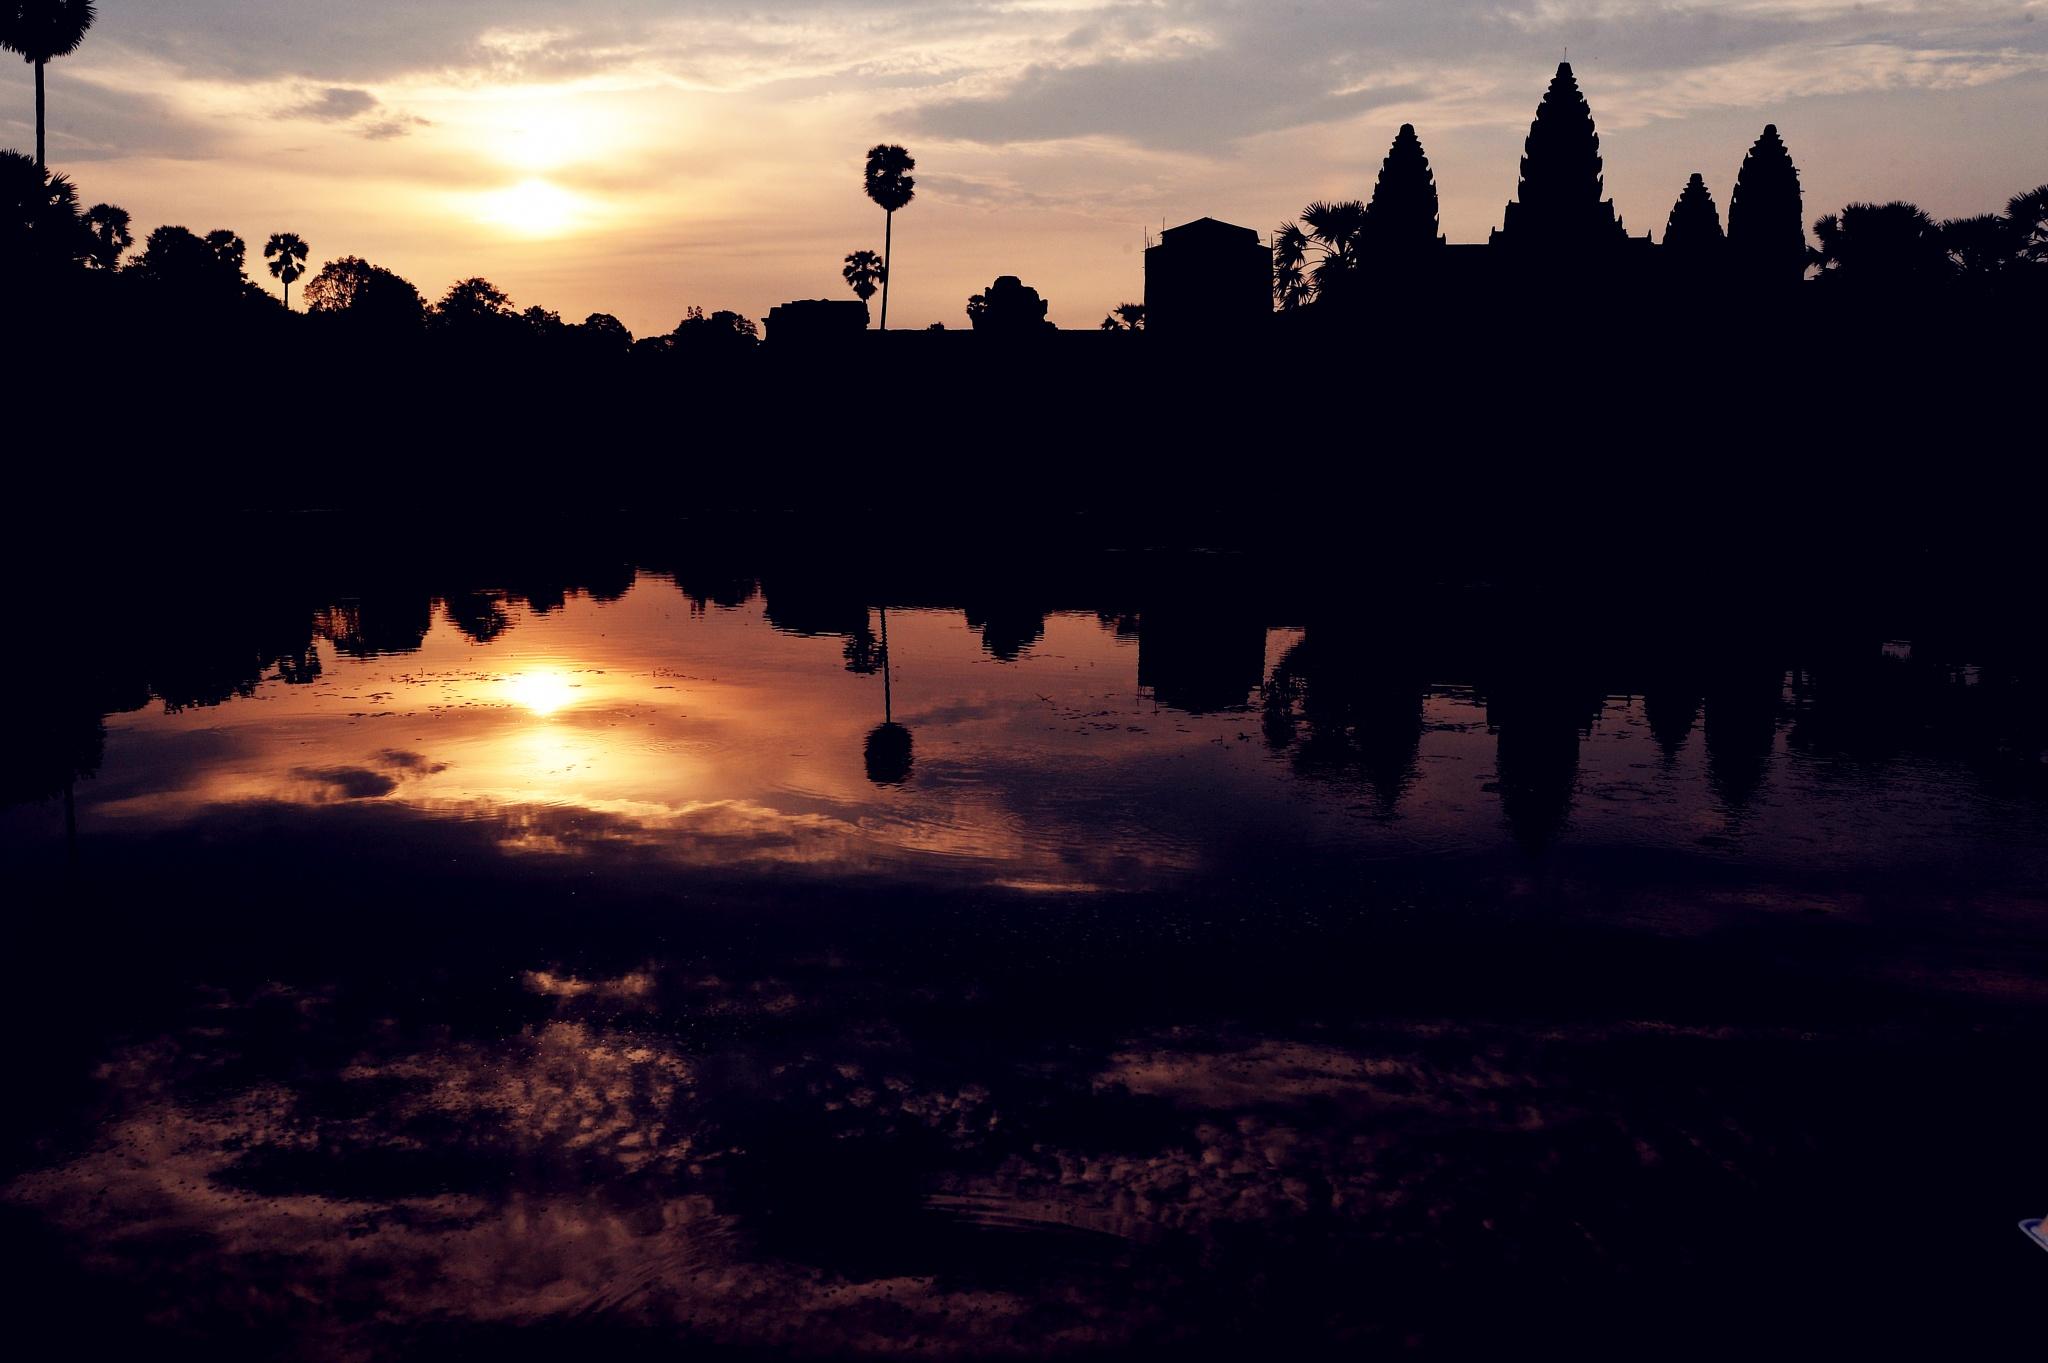 Dawn of Angkor Wat  by XQMe